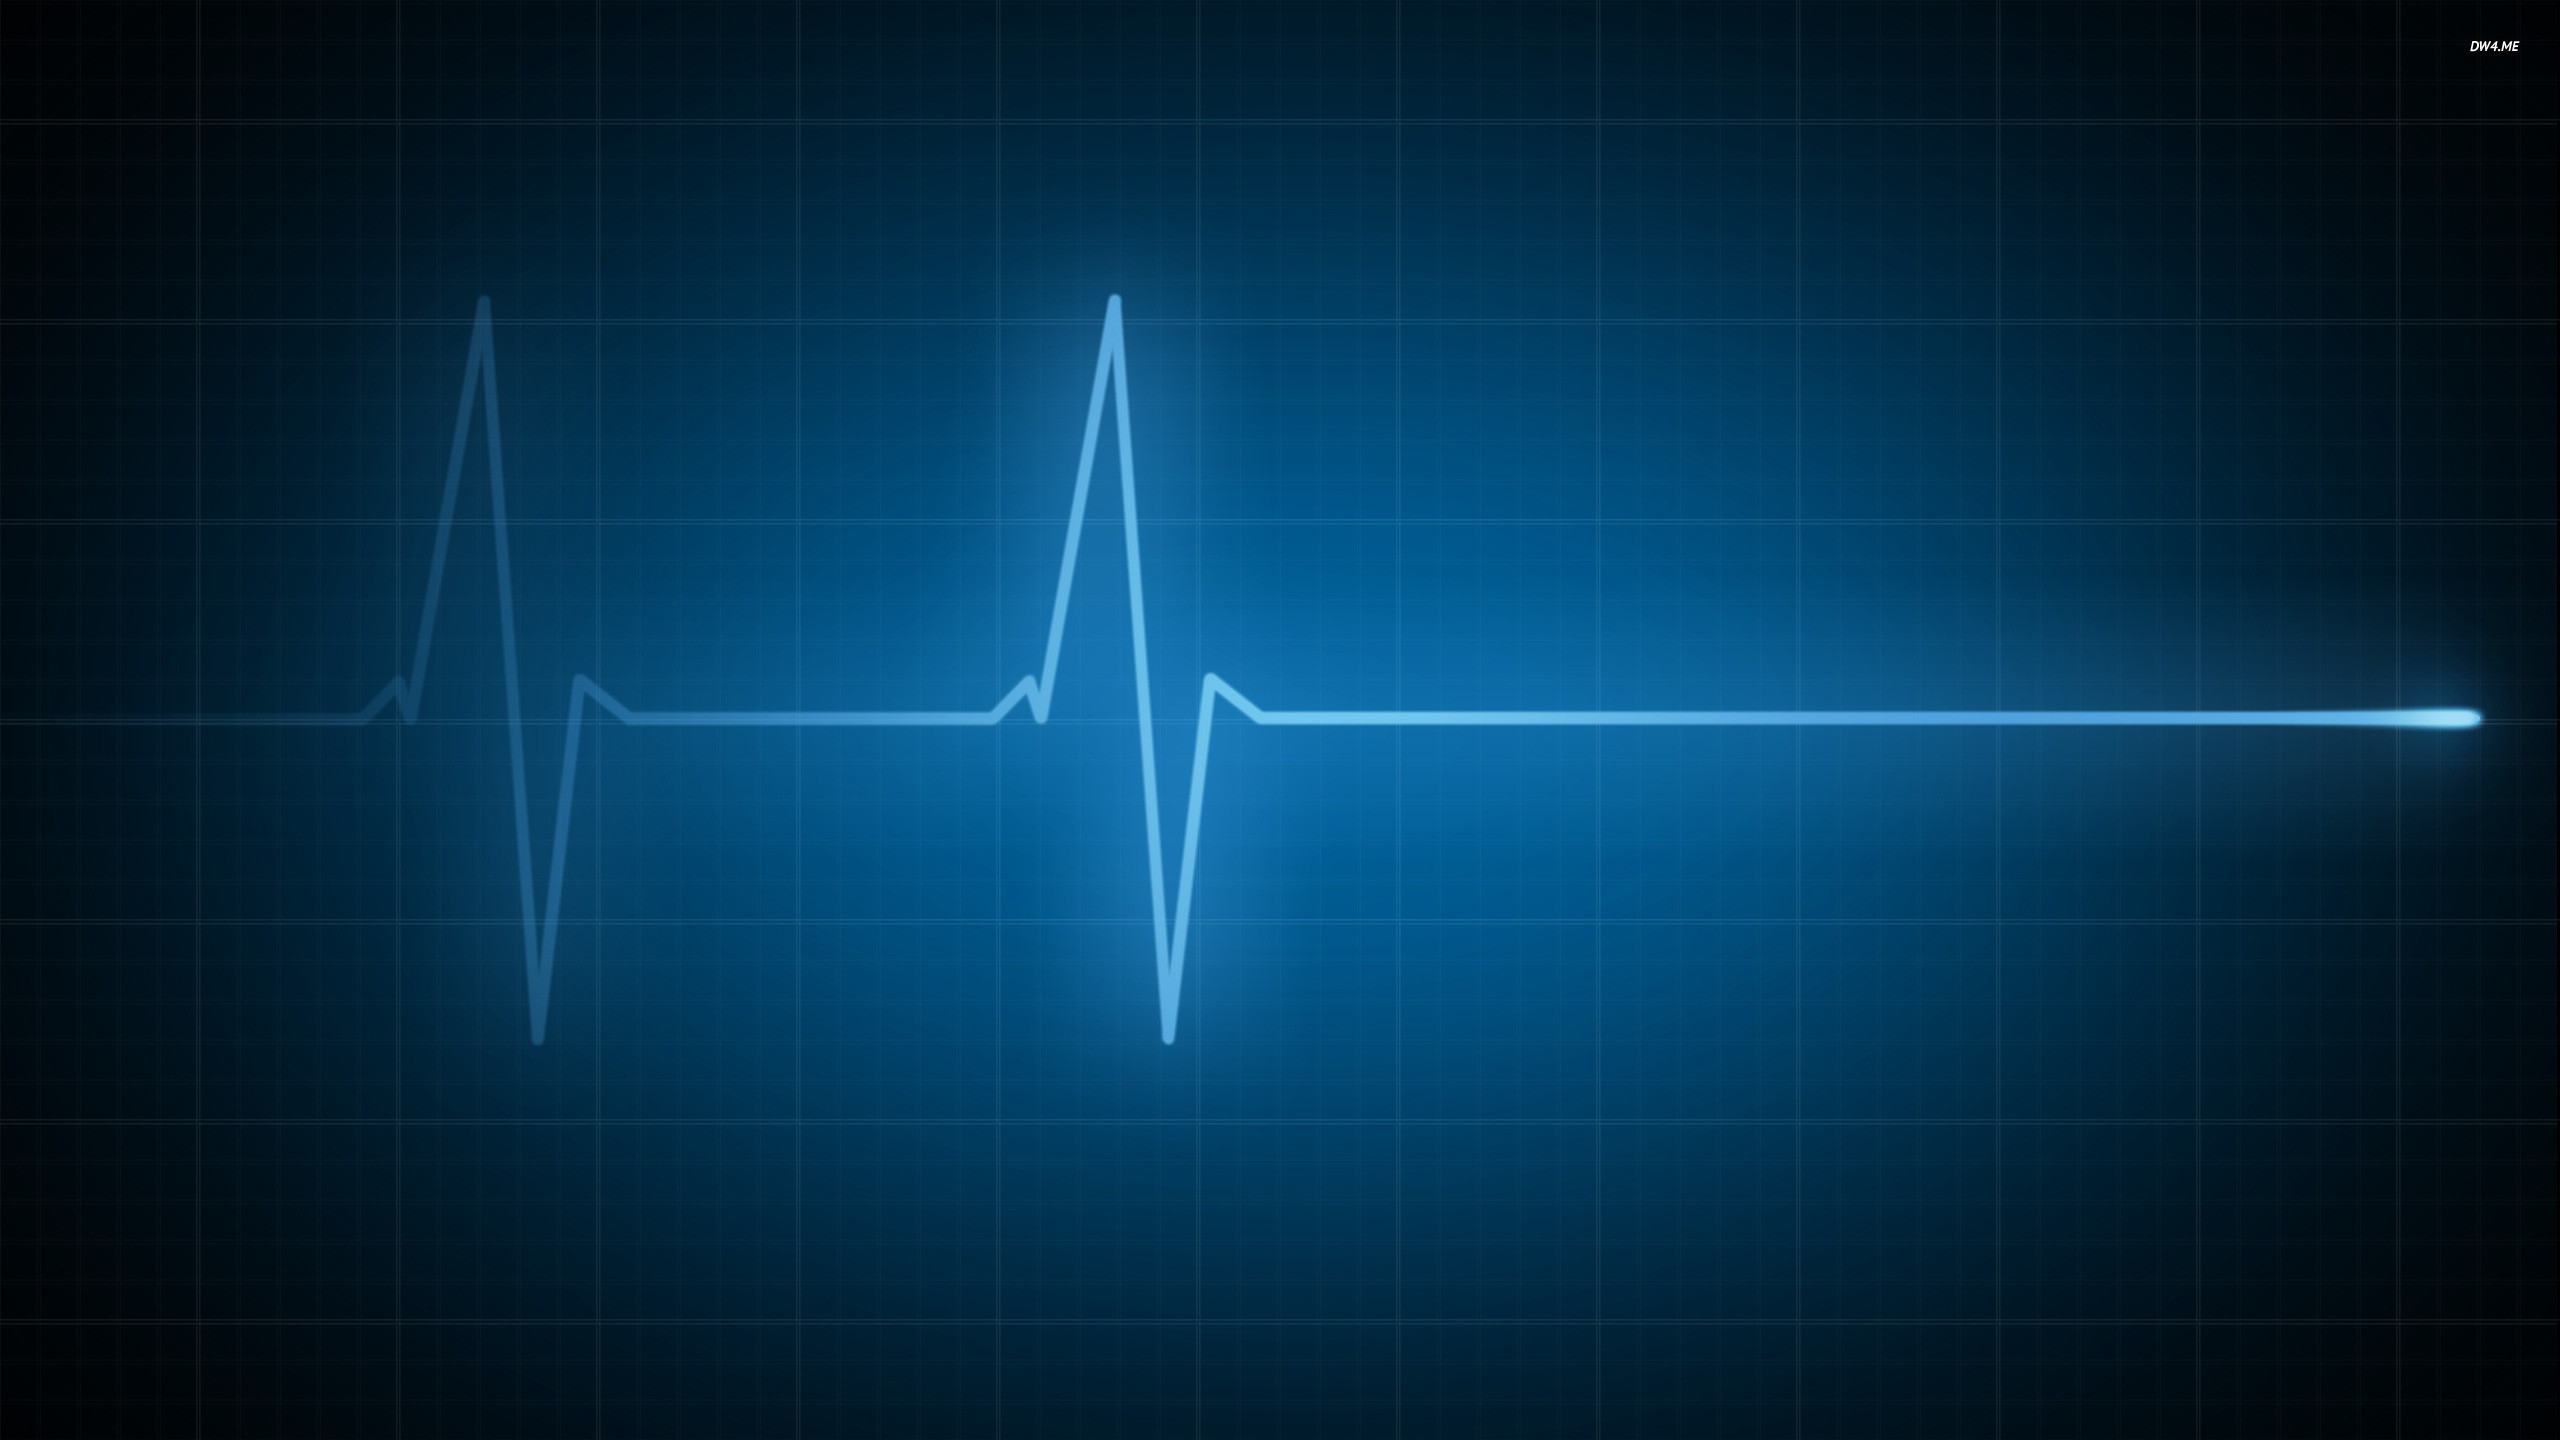 Heartbeat wallpaper – Digital Art wallpapers – #2484